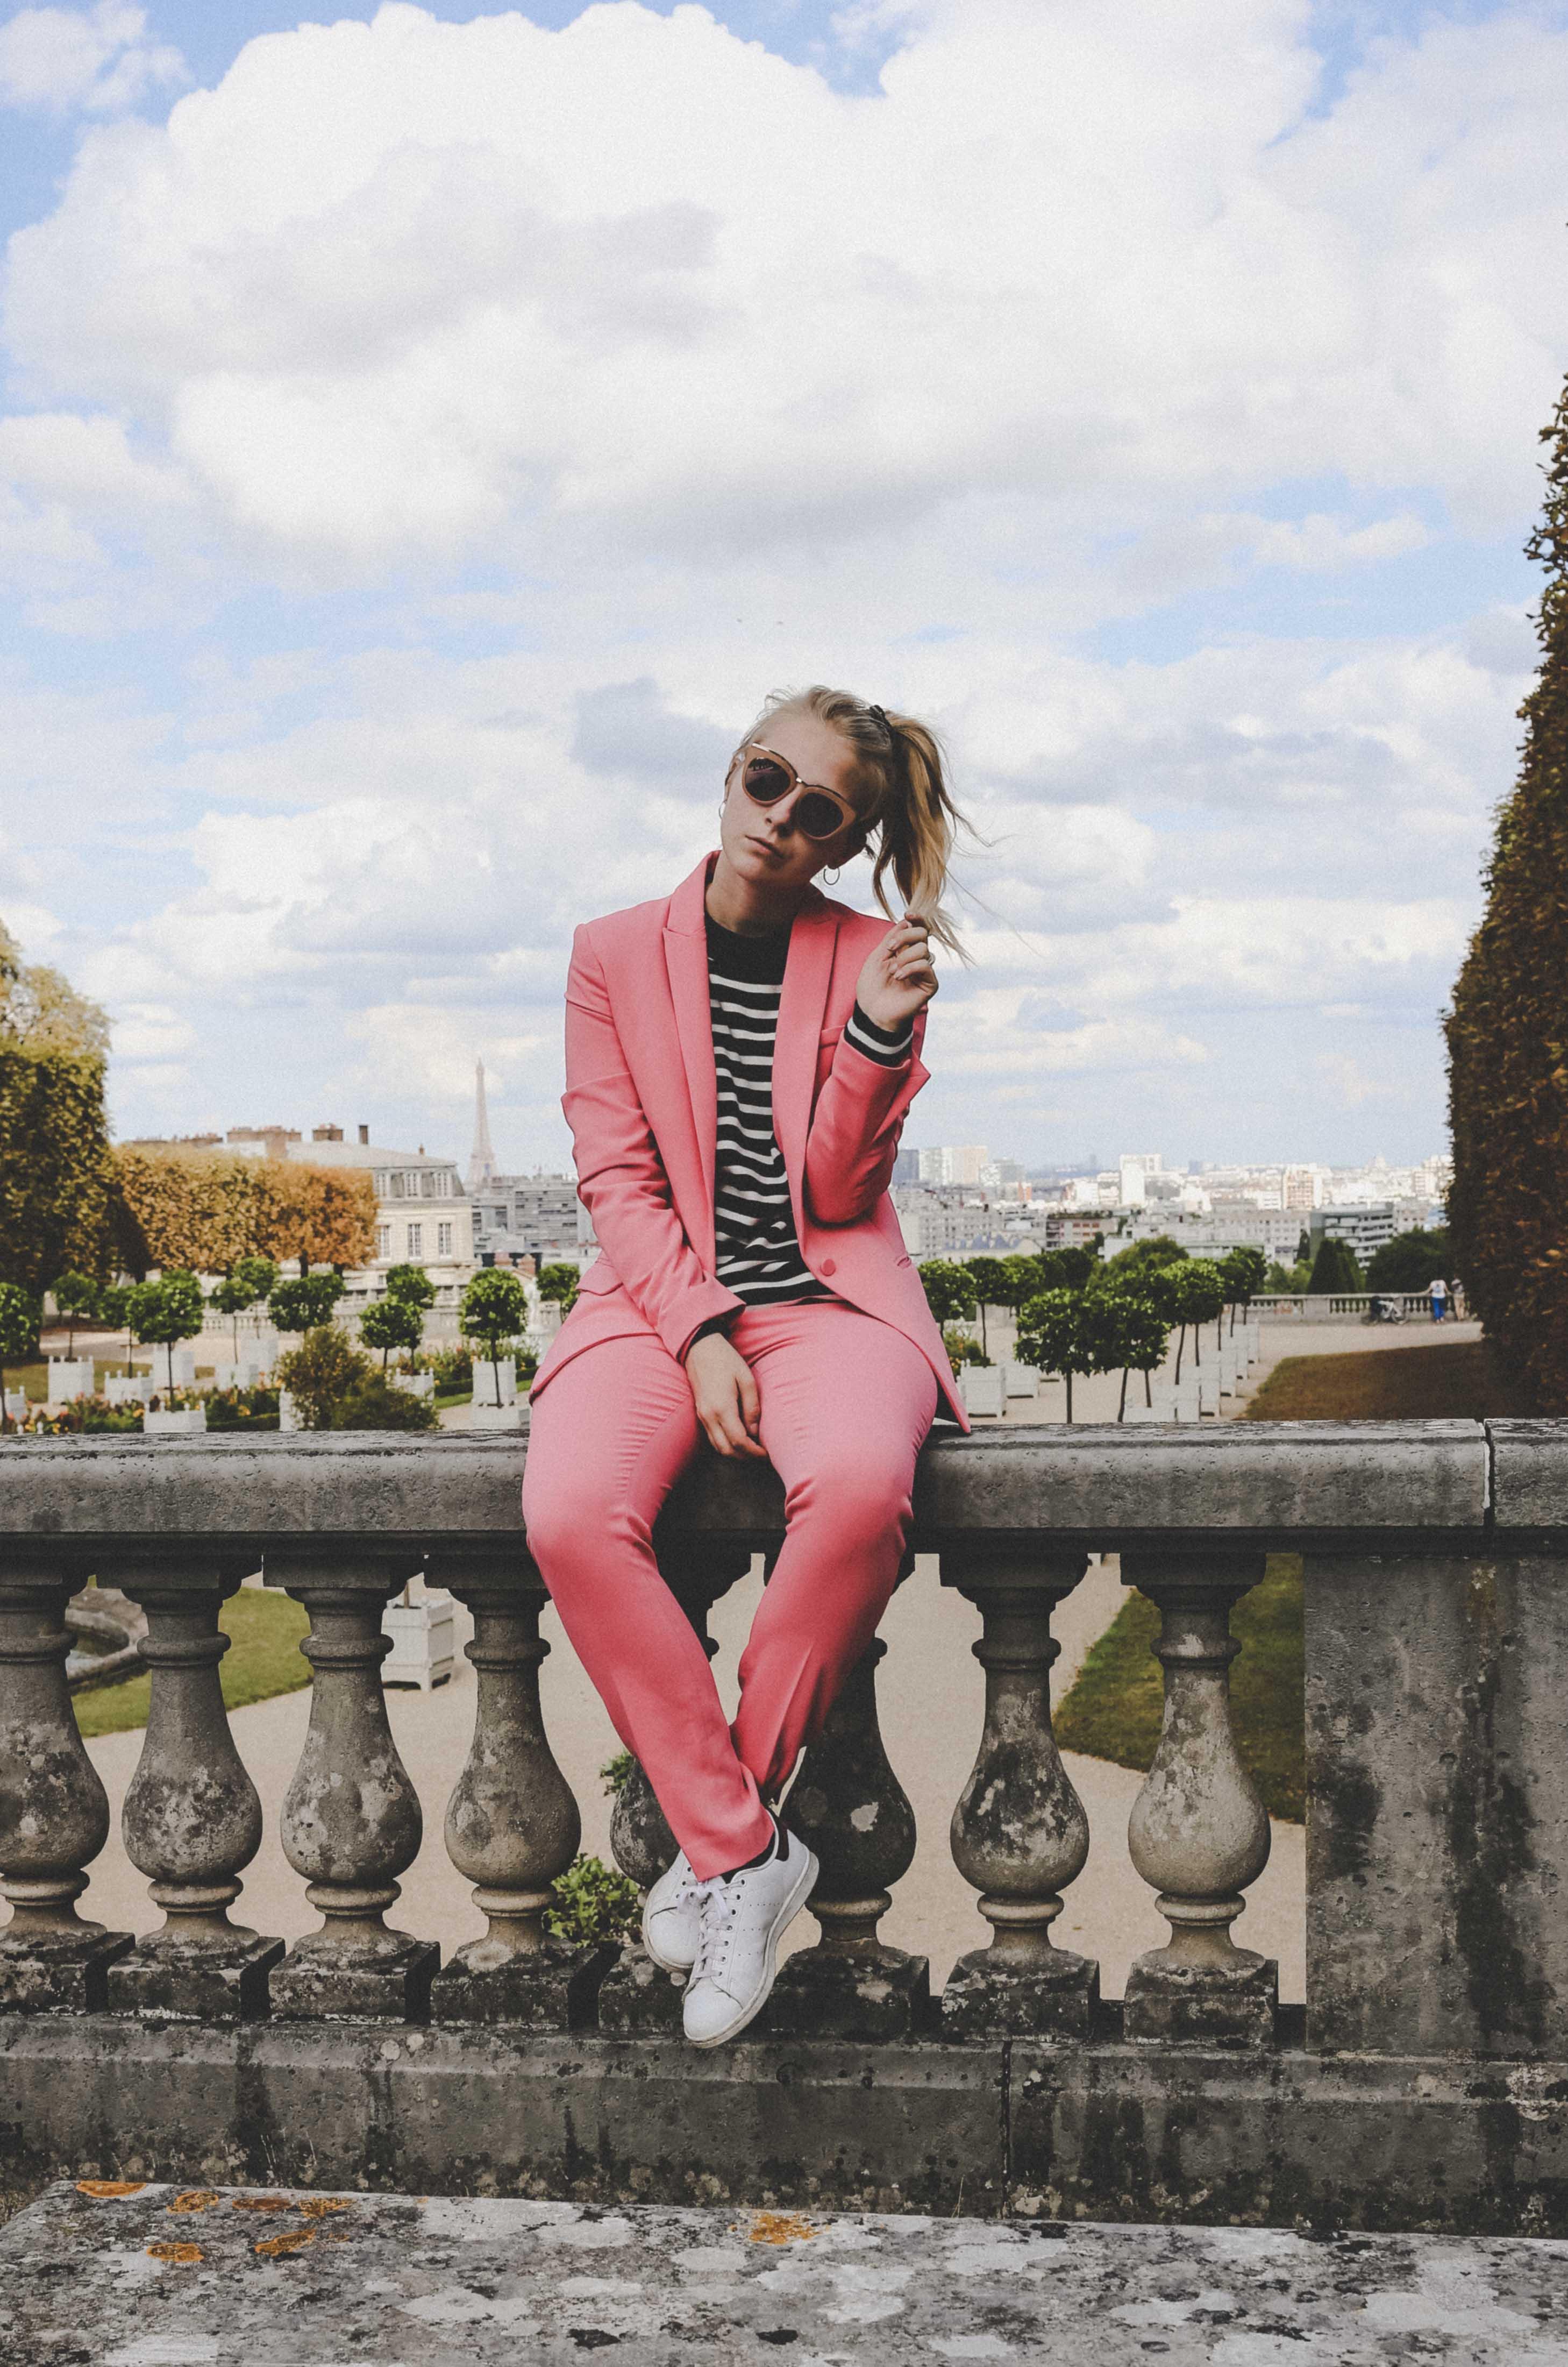 trendreport-pinker-hosenanzug-pink-suit-how-to-paris-fashionblog-modeblog-outfit_1827